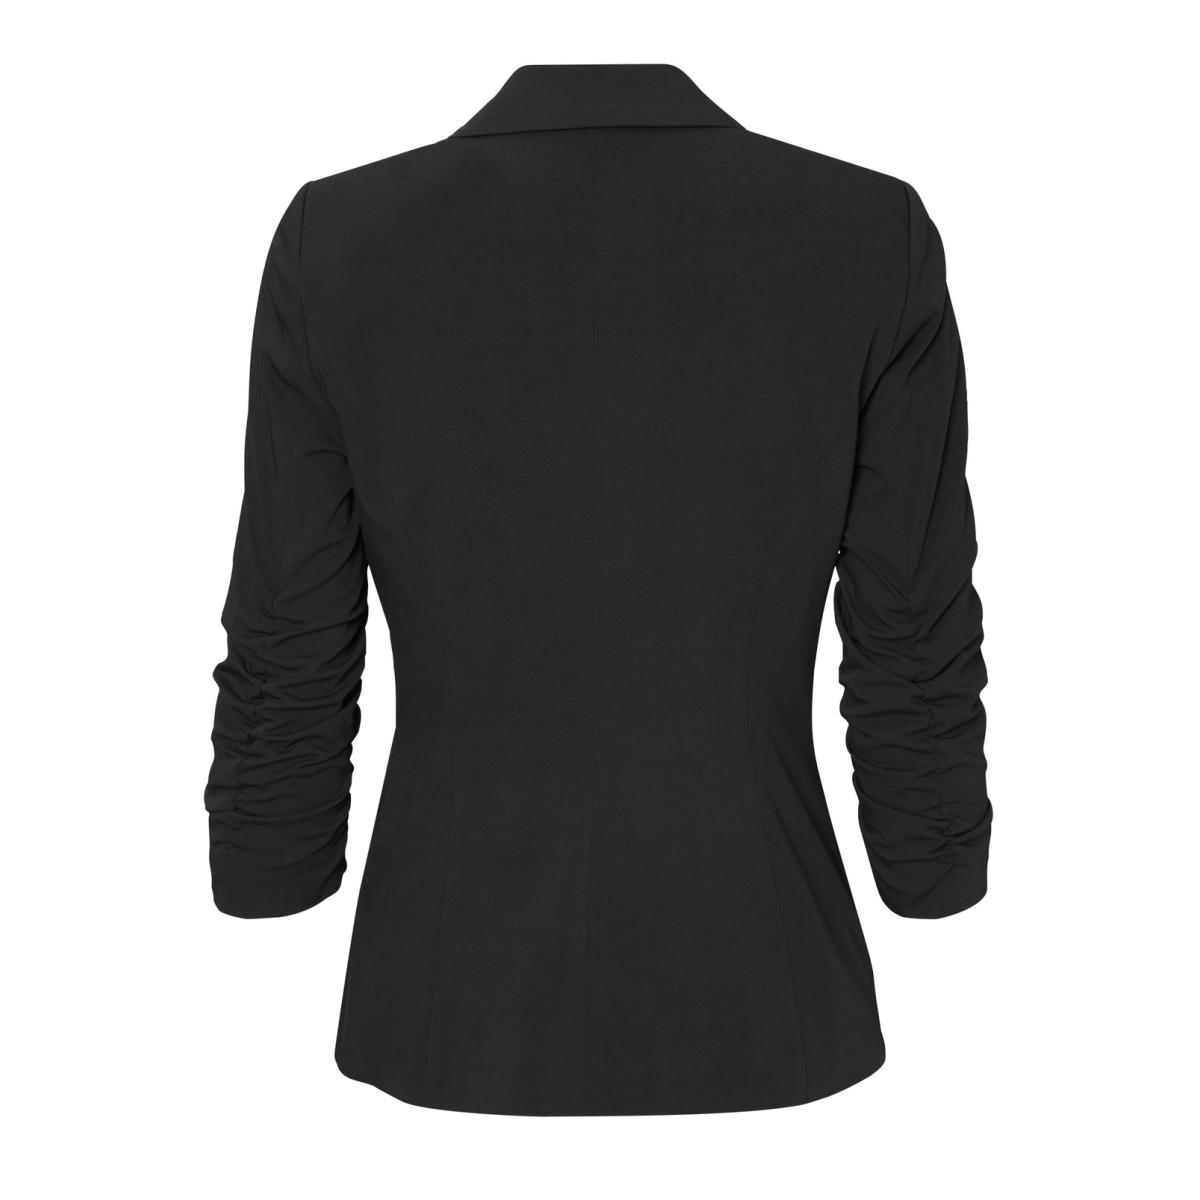 vmwrinkly 3/4 blazer noos 10179859 vero moda blazer black